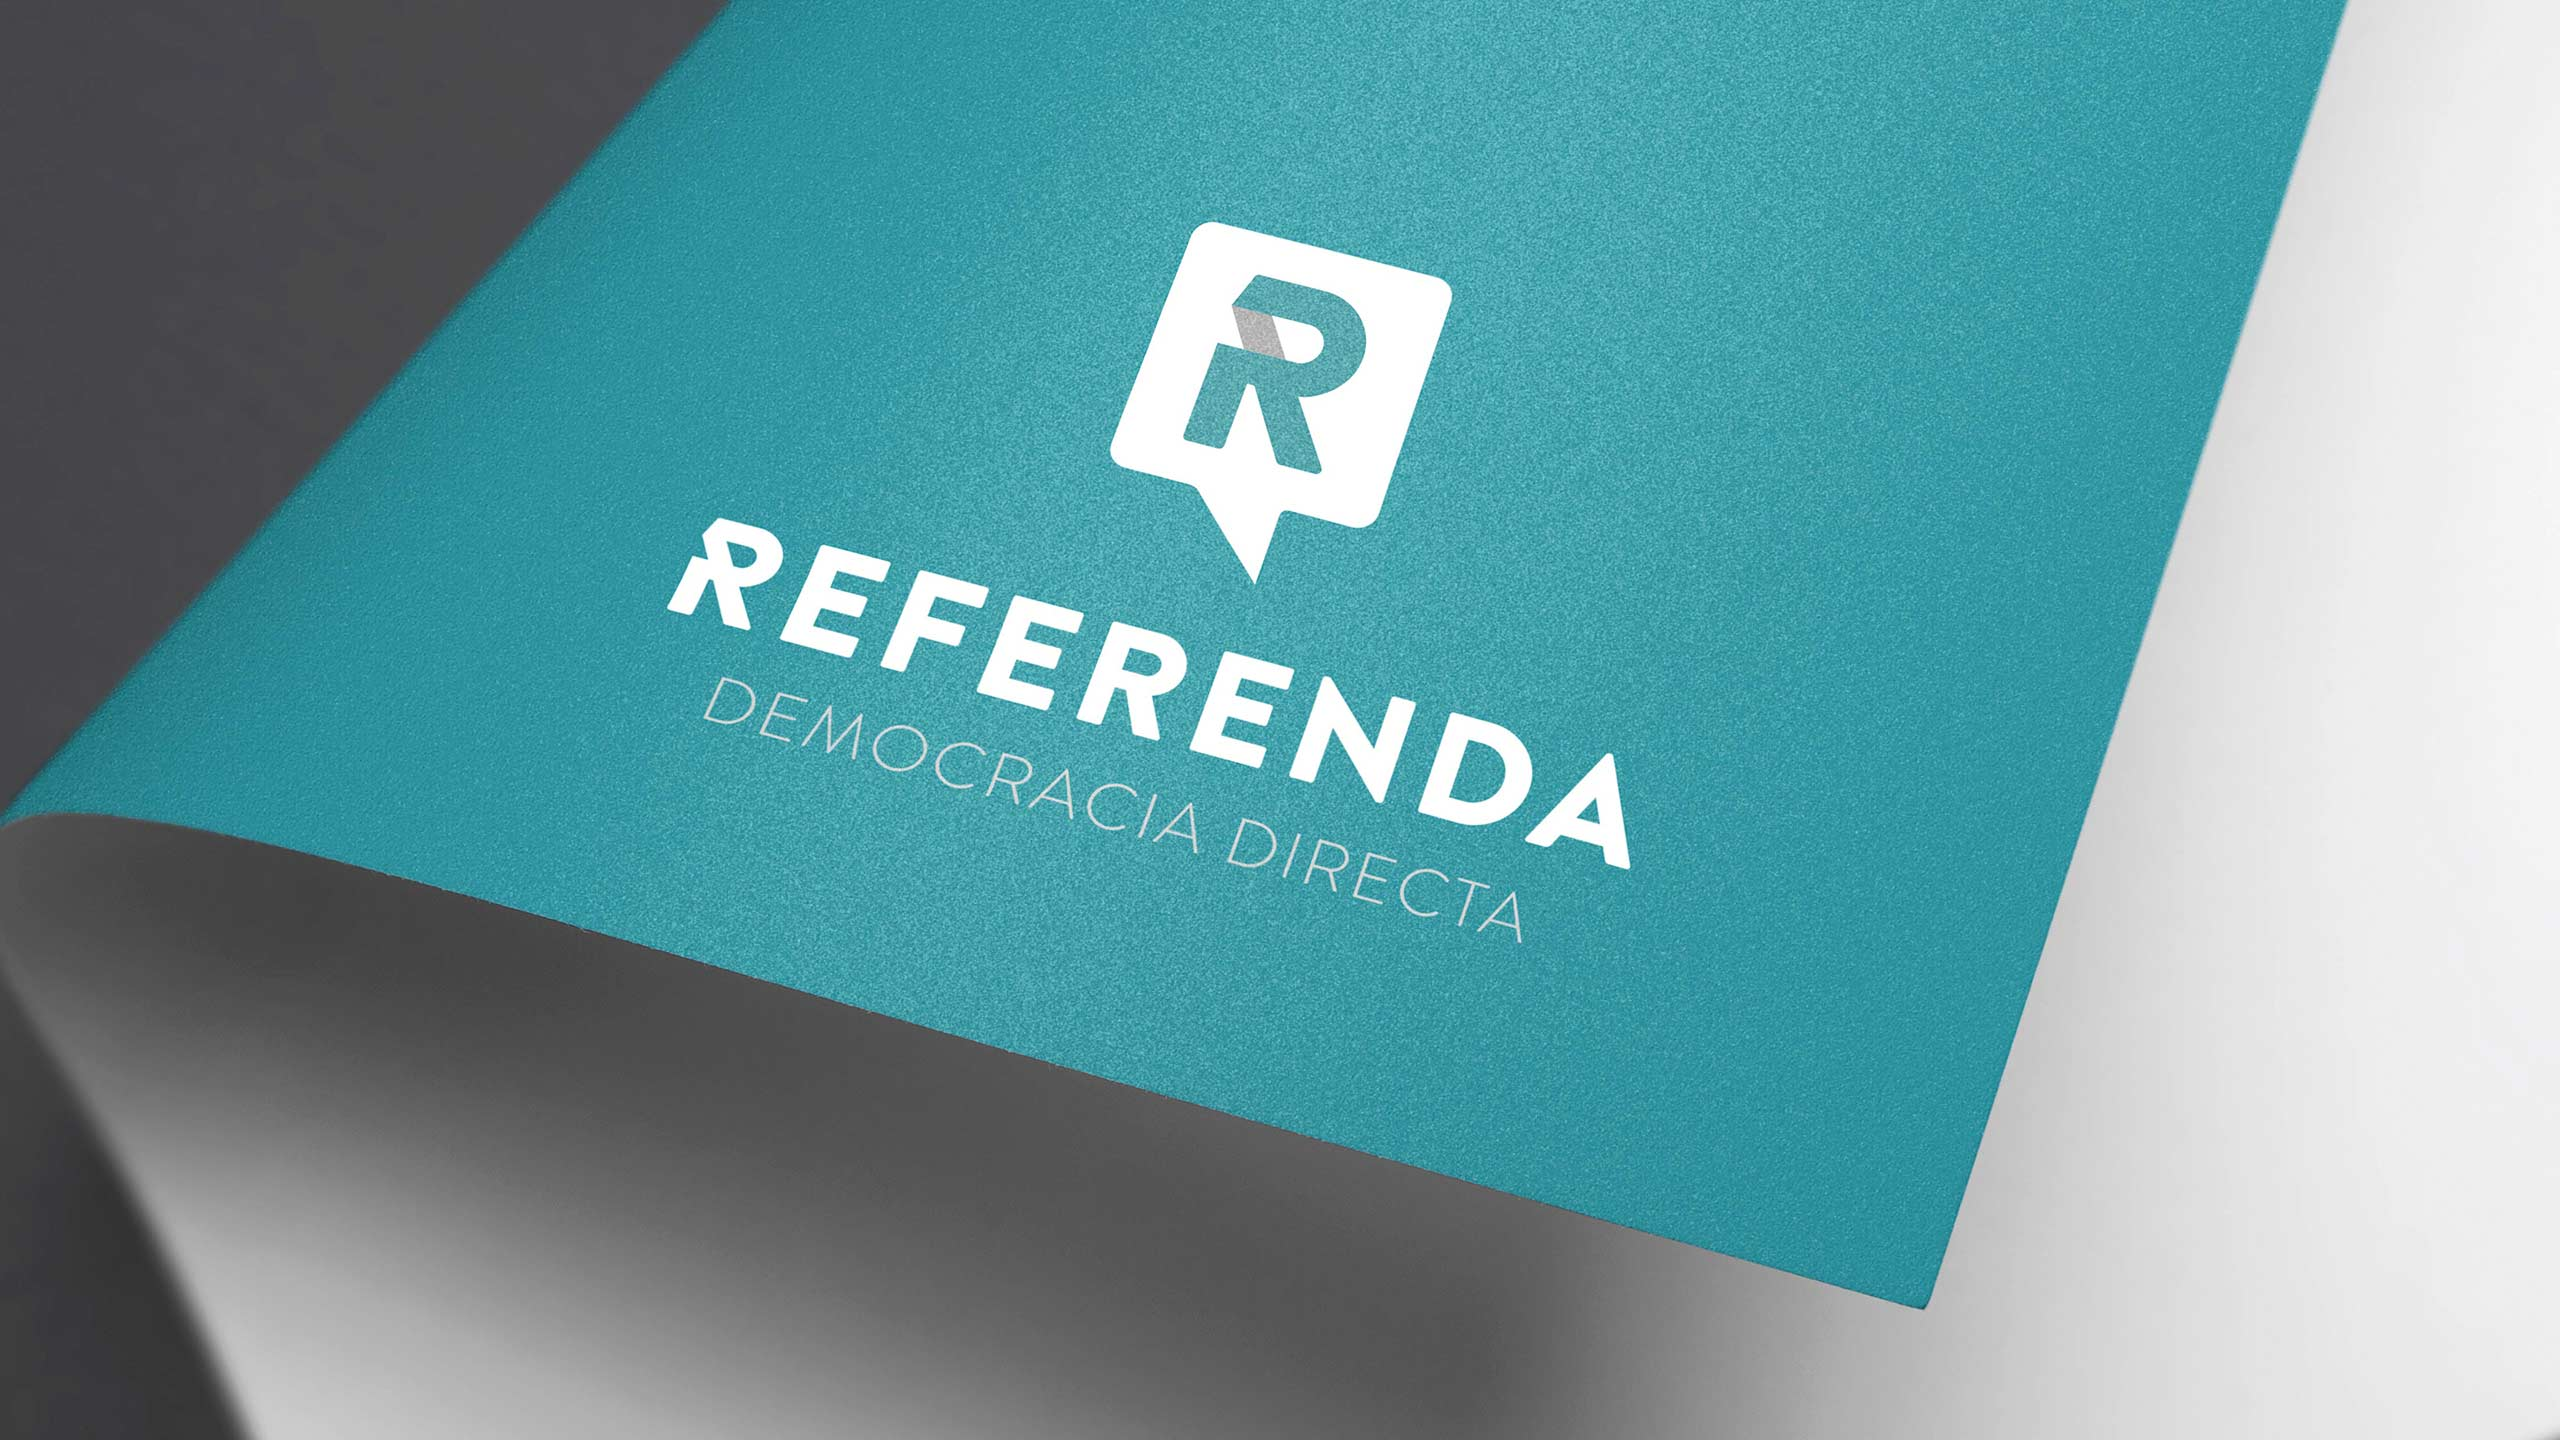 kamikaze_referenda_politica_logotipo_design_01_